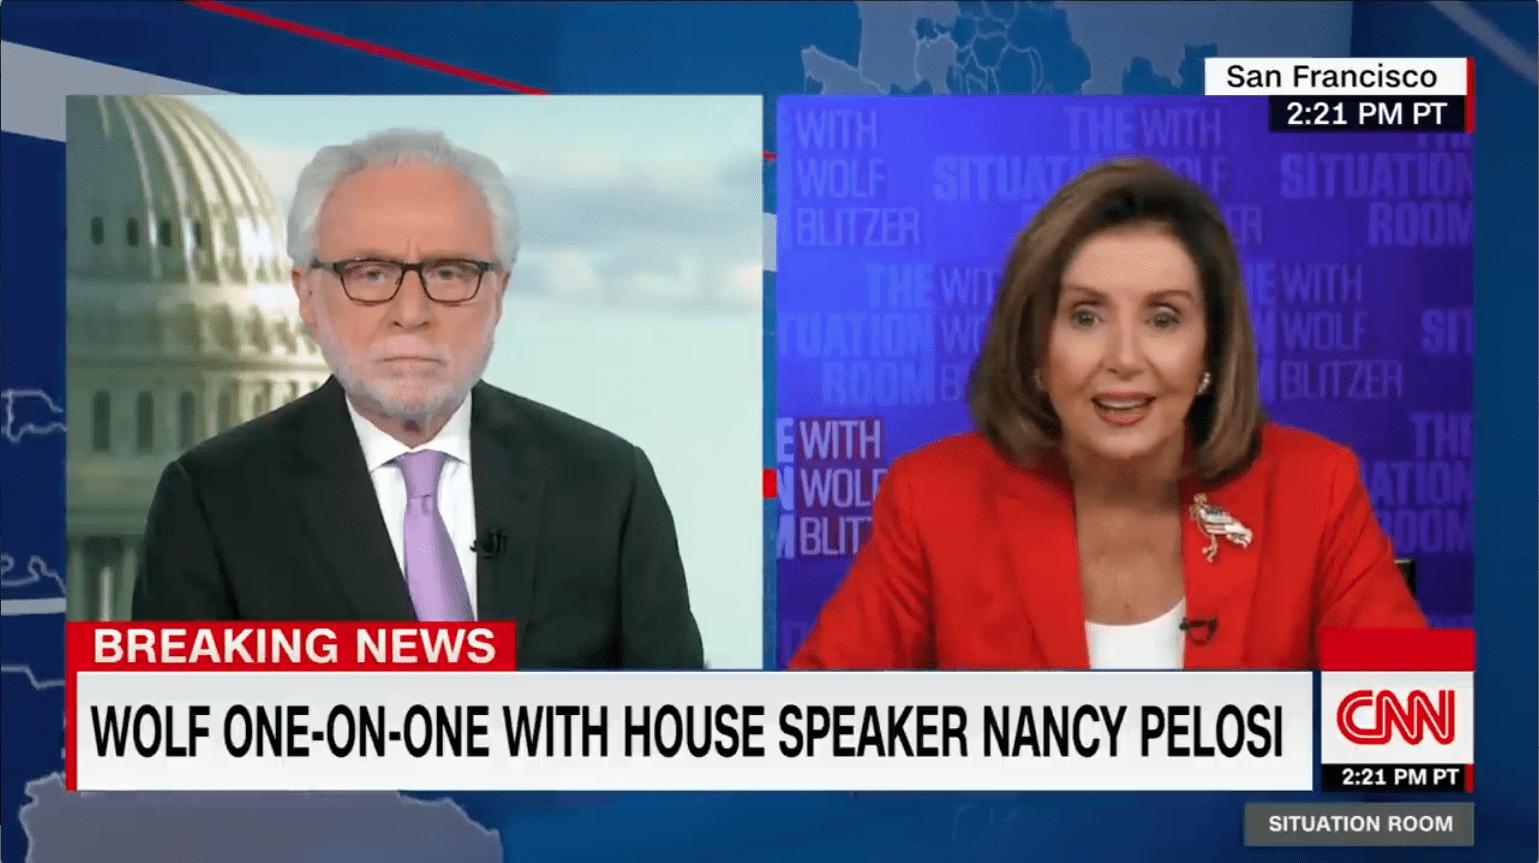 The Wolf Pelosi Stimulus Bill Argument